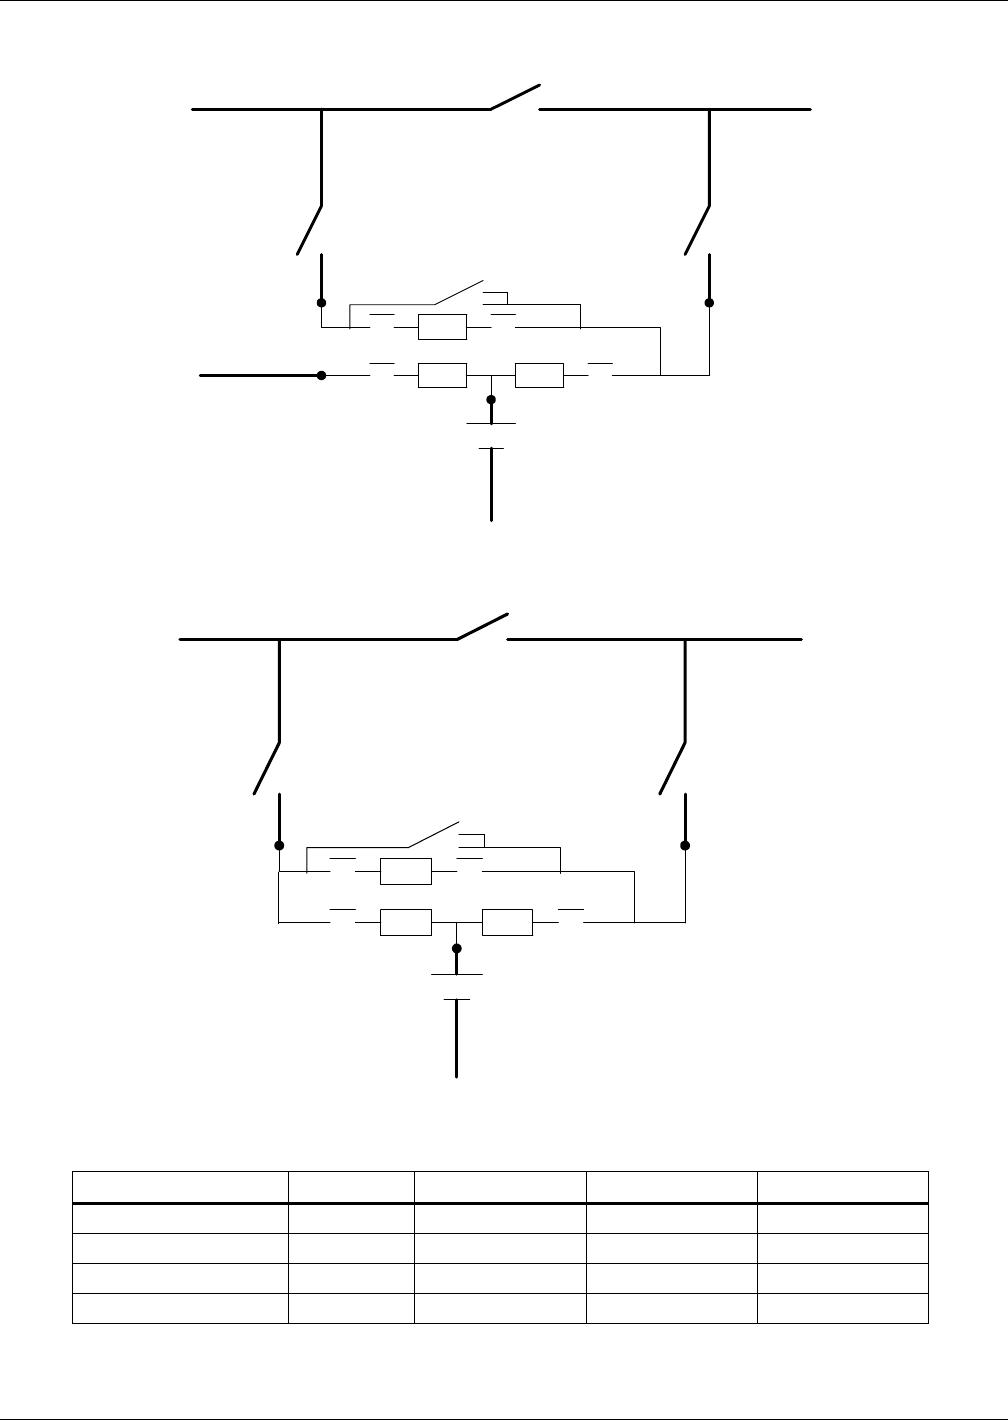 Manual De Operacion Ups Liebert Npower Circuit Breaker Wiring Diagram Symbol Moreover Decimals Worksheet 5th Operation